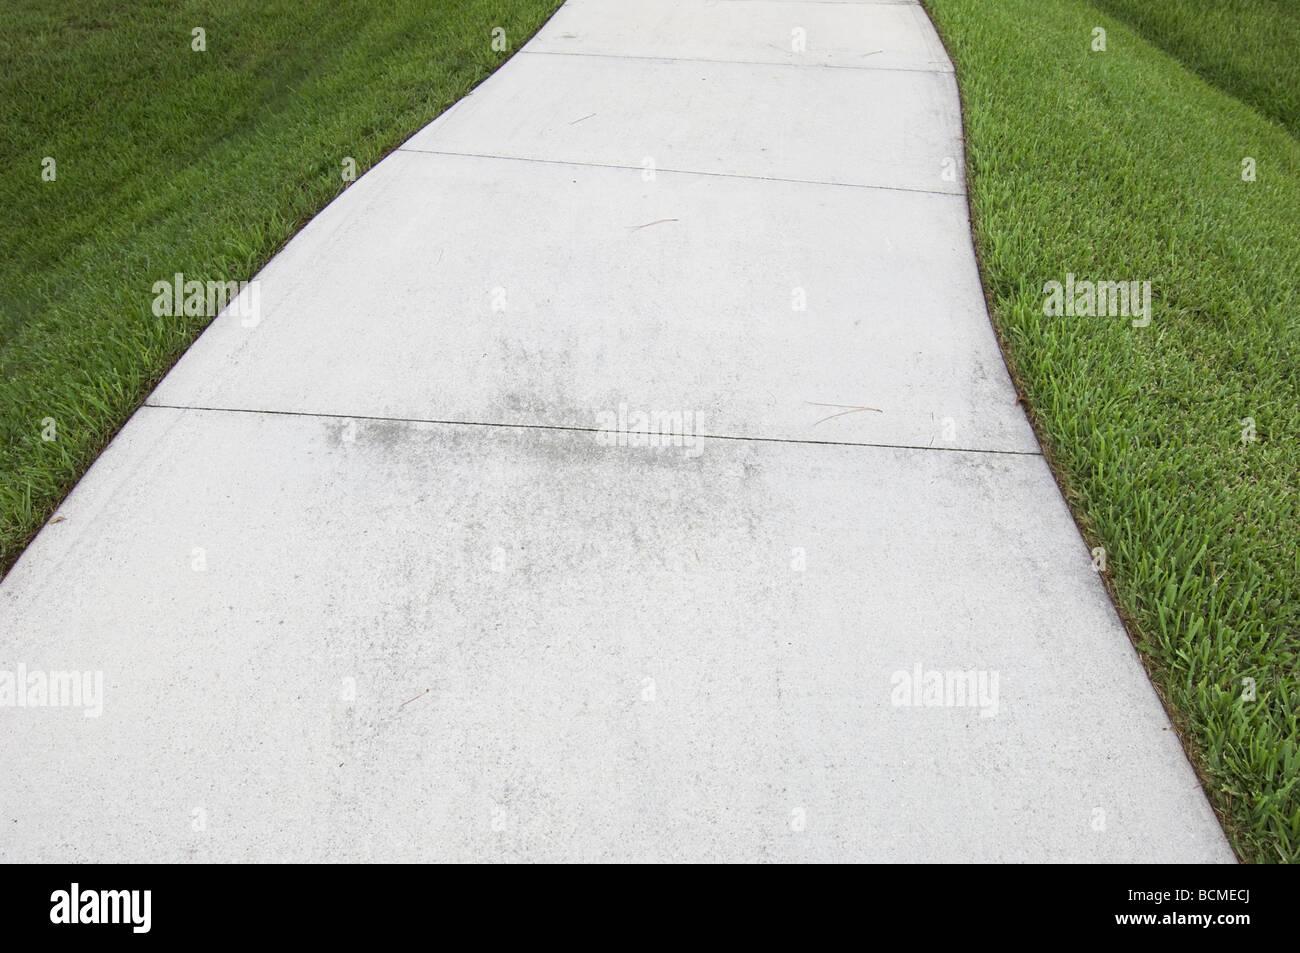 gebogene Bürgersteig durch Rasen Stockbild